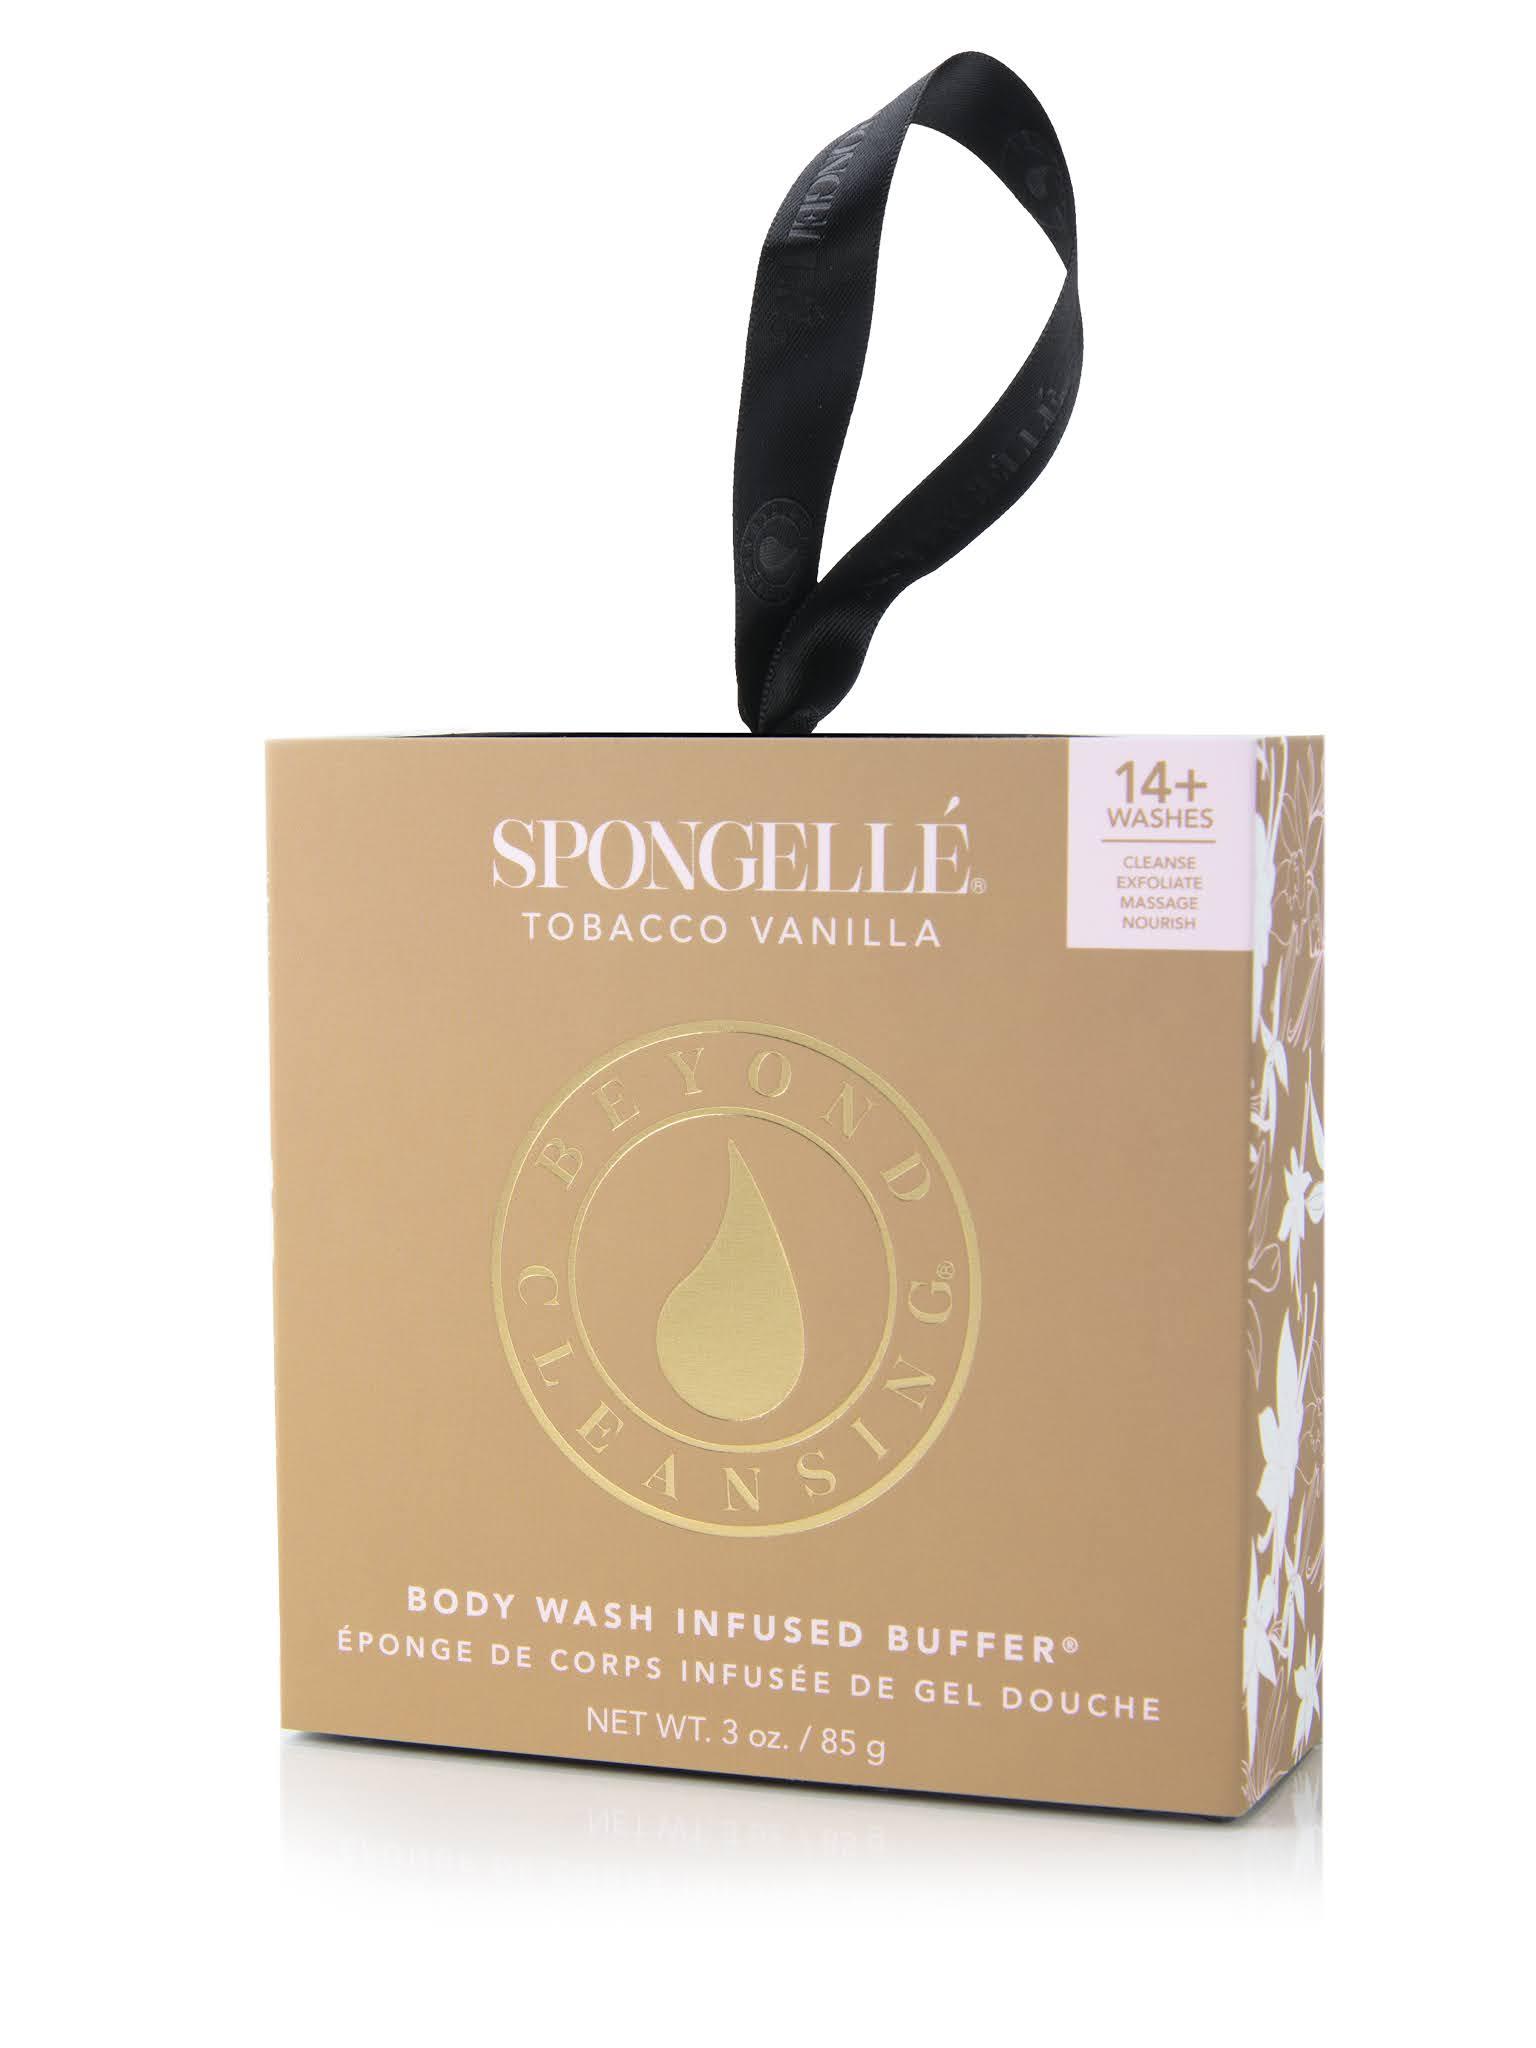 Spongellé Tobacco Vanilla Boxed Flower